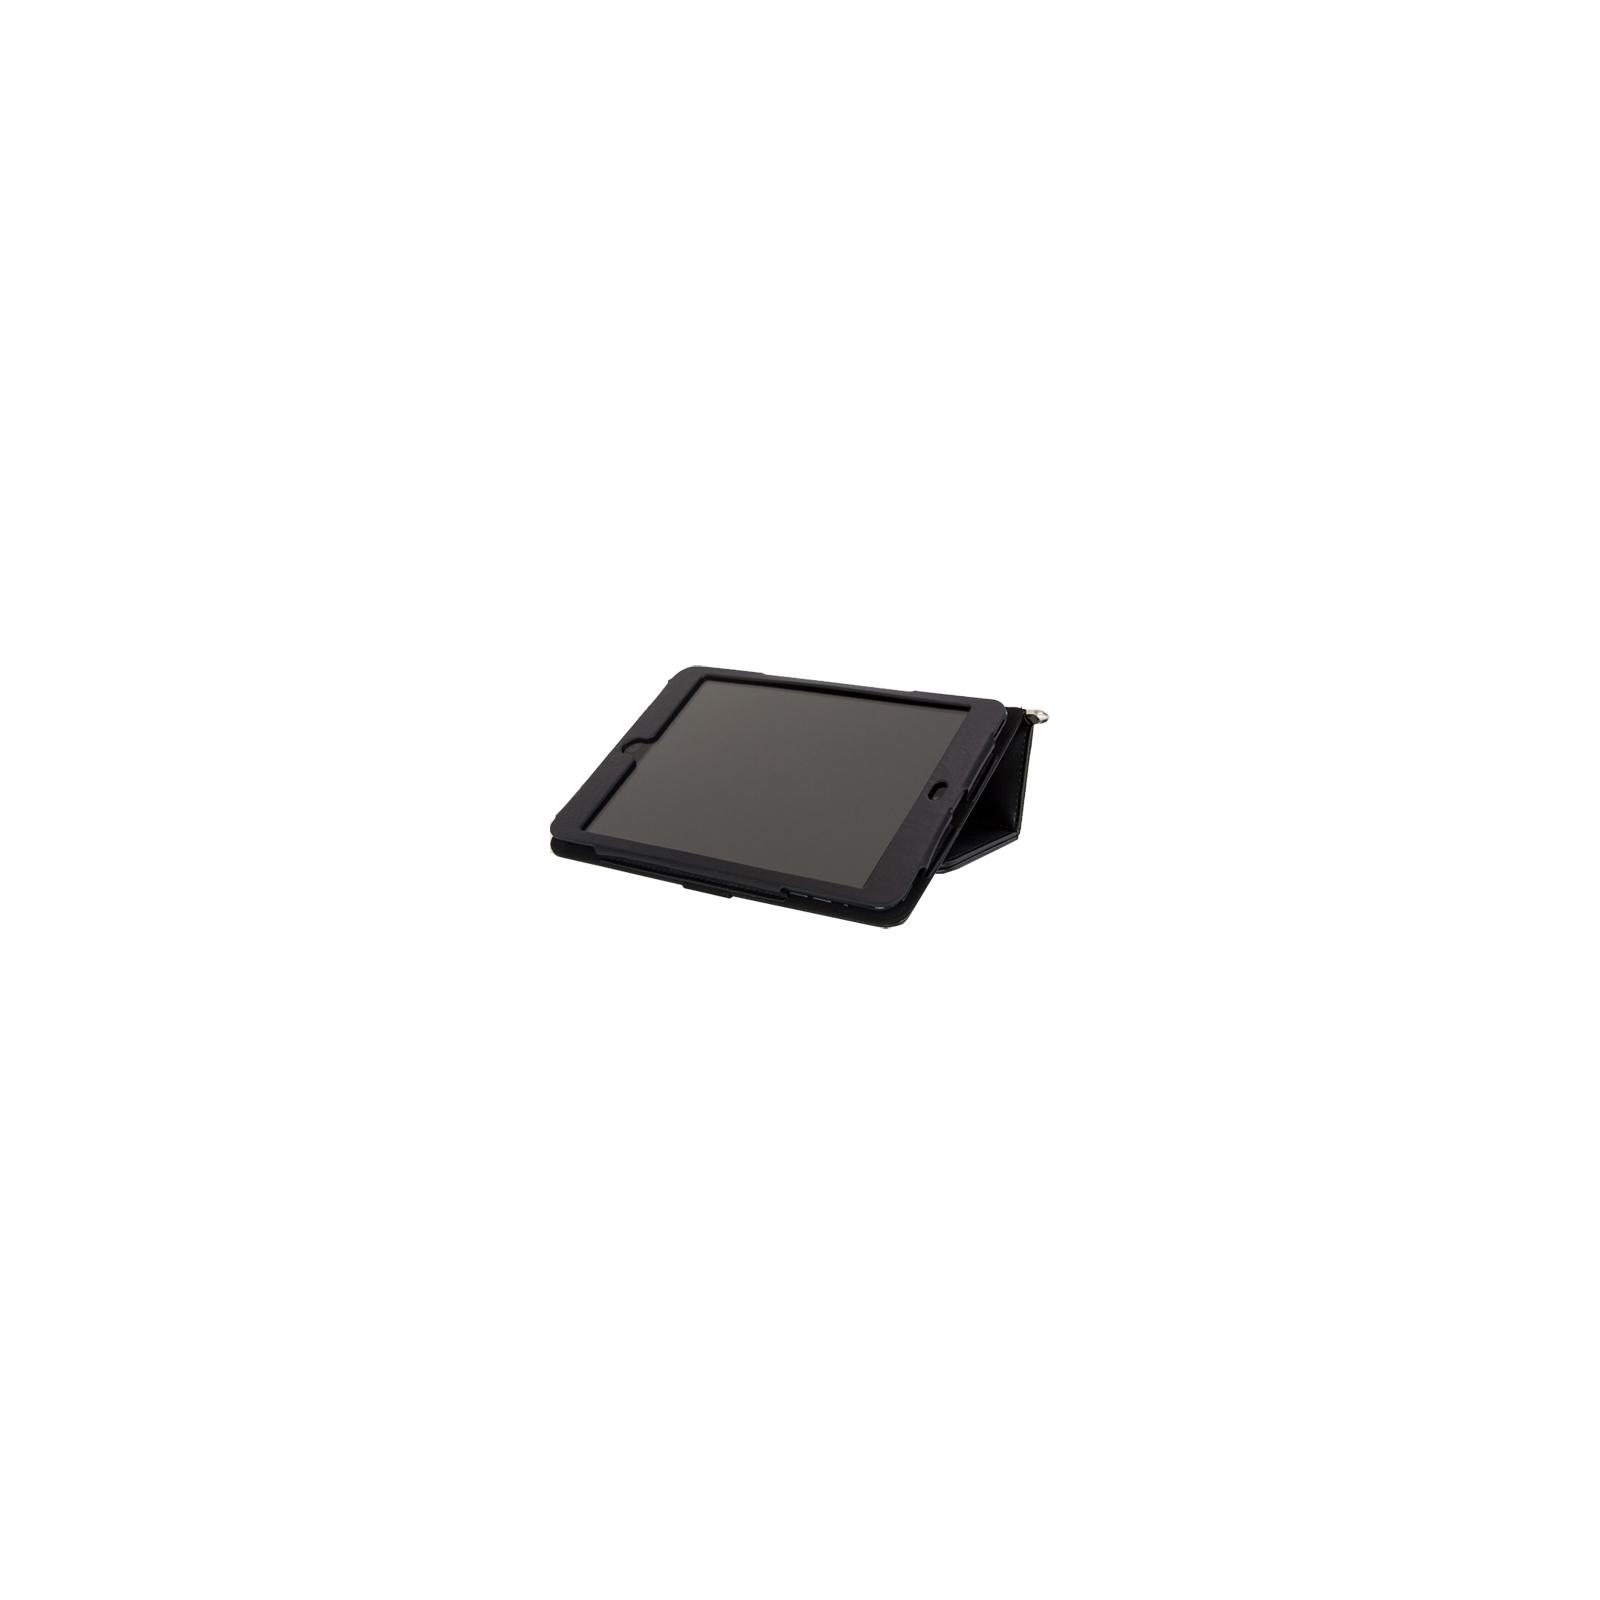 Чехол для планшета ODOYO IPAD AIR /GENUINE LEATHER FOLIO BLACK (PA536BK) изображение 7